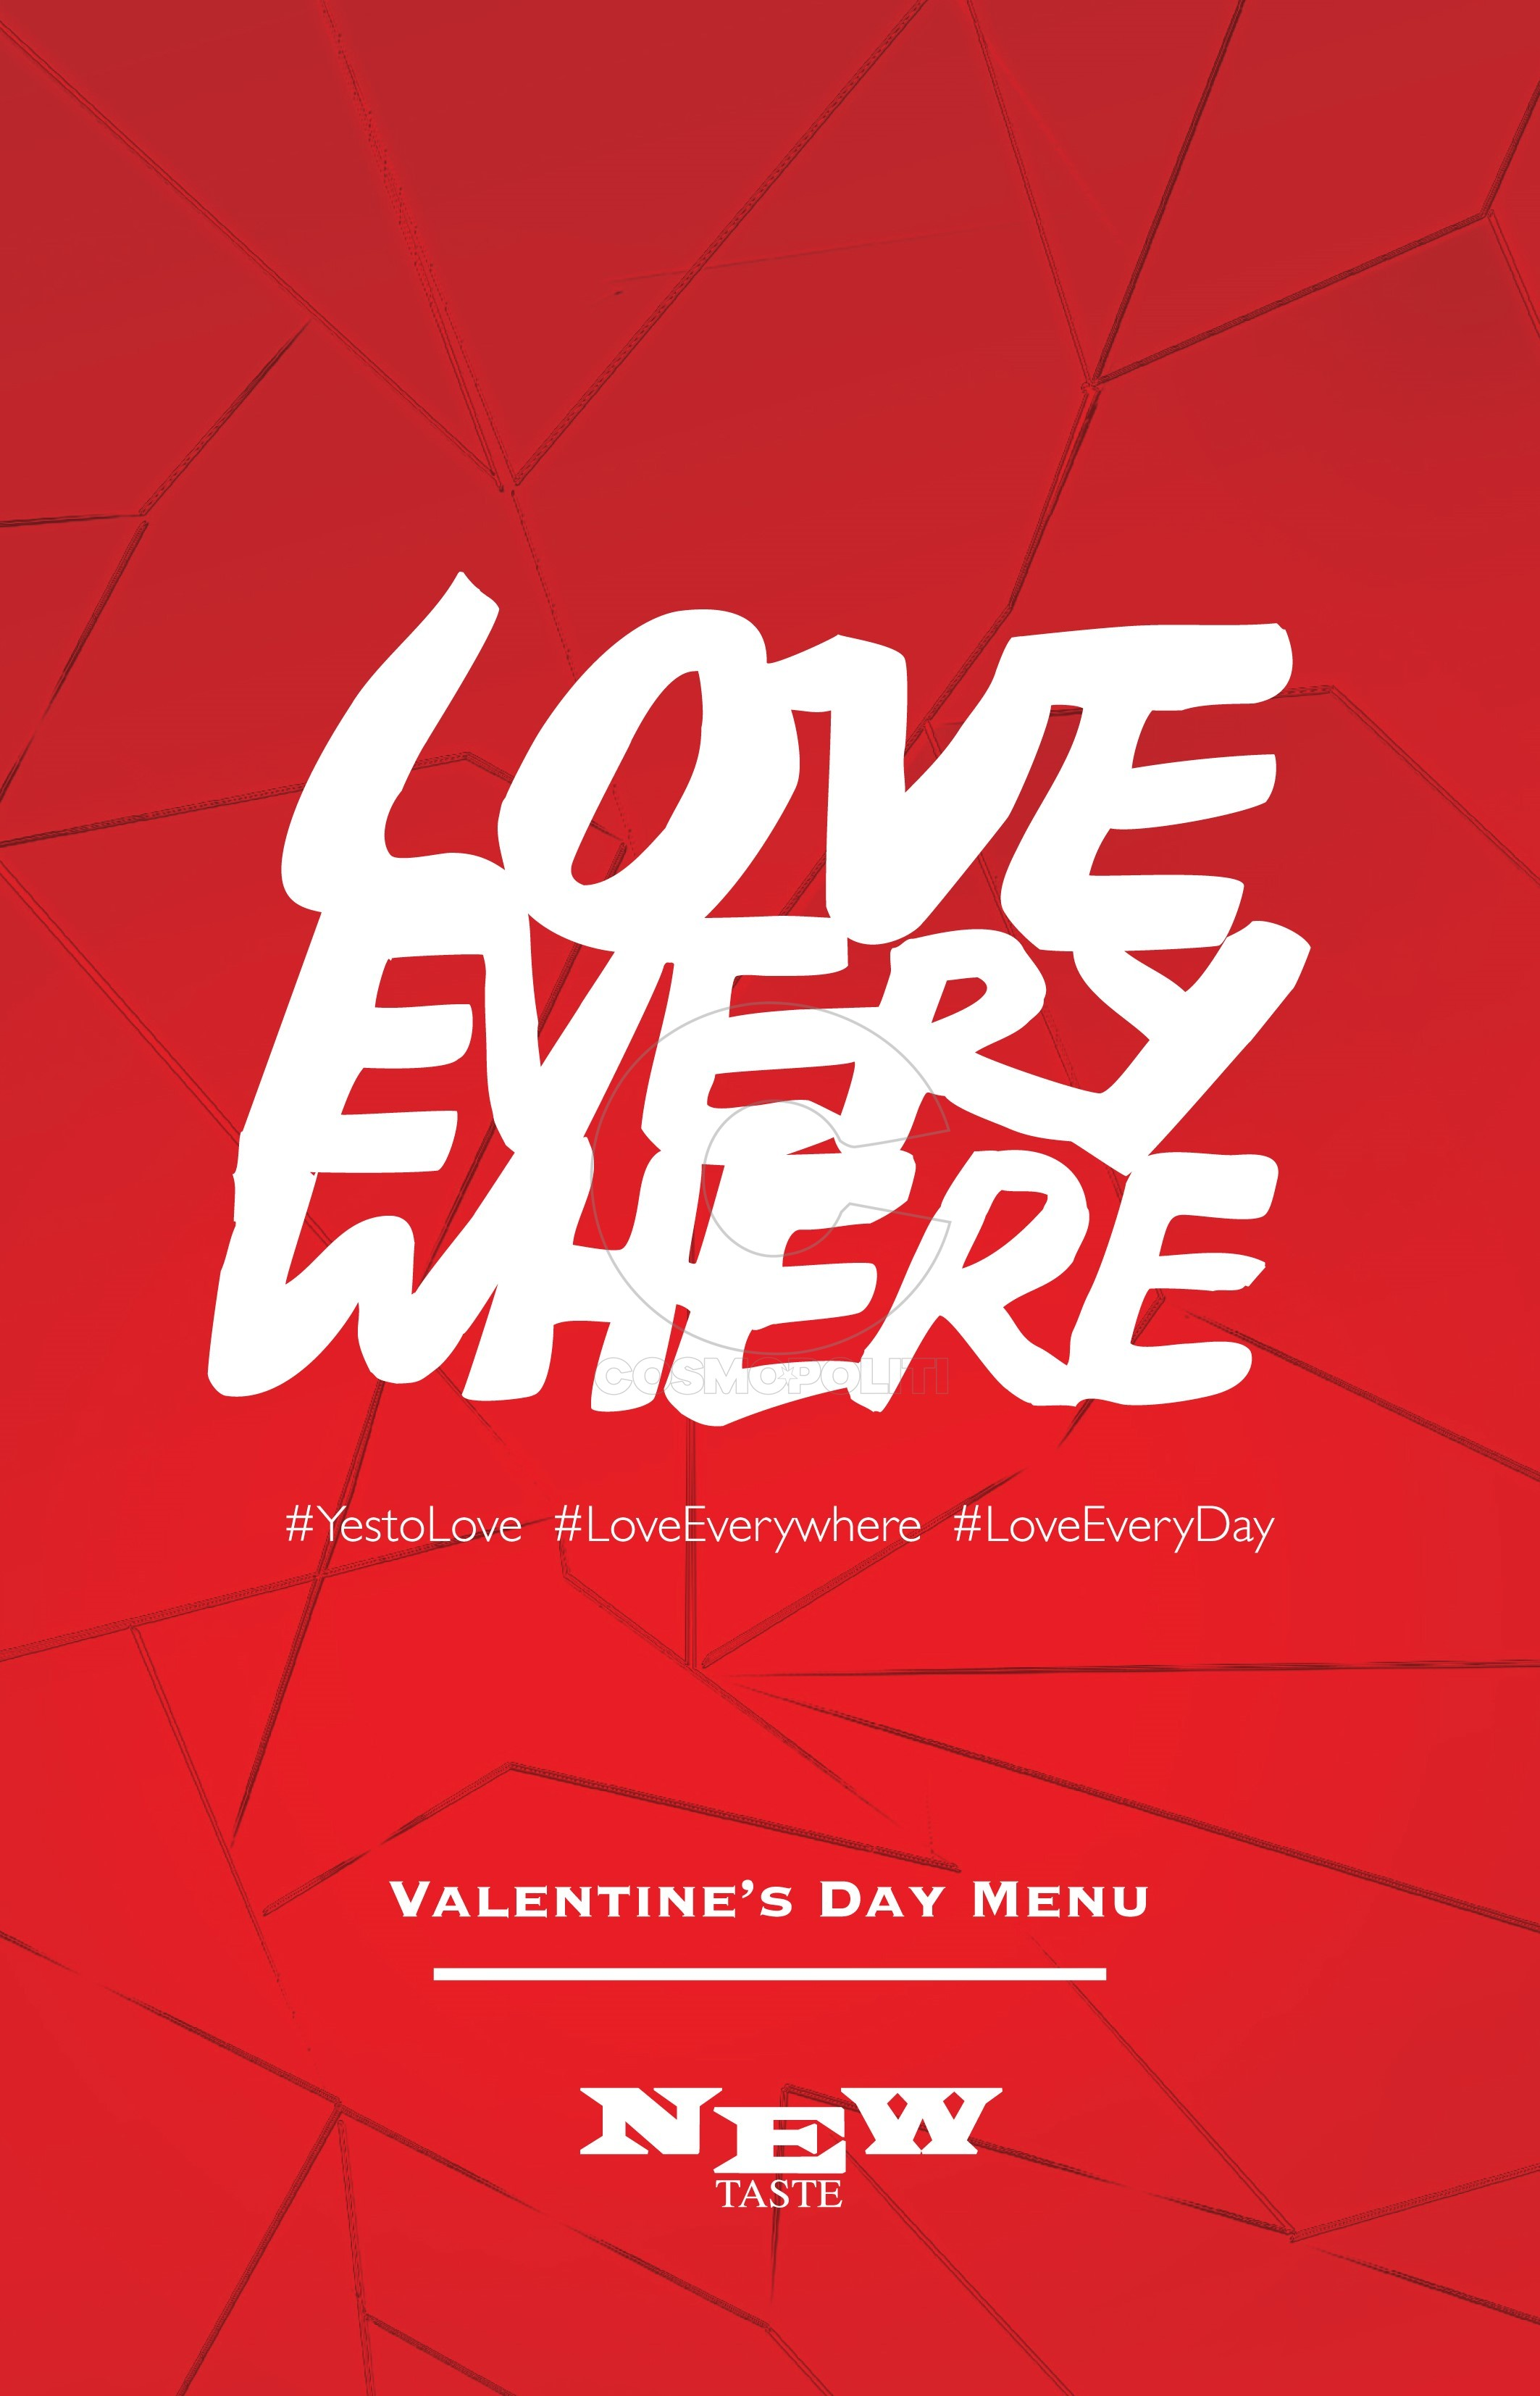 #LoveEverywhere